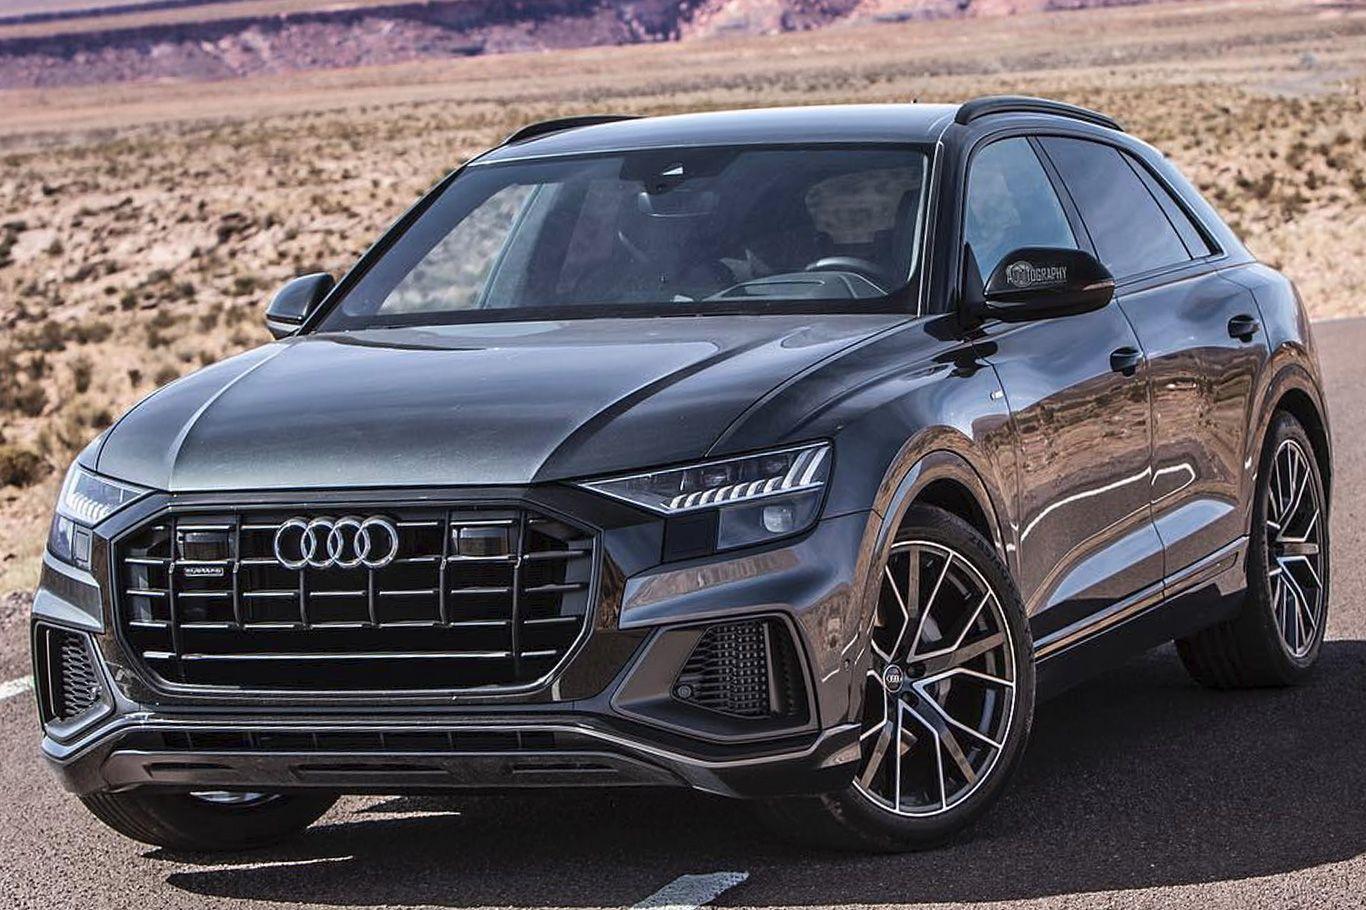 Photos Audi Sq8 Rsq8 Q8rs 2019 From Article Quattro Returns Audi Best Luxury Cars Audi Suv